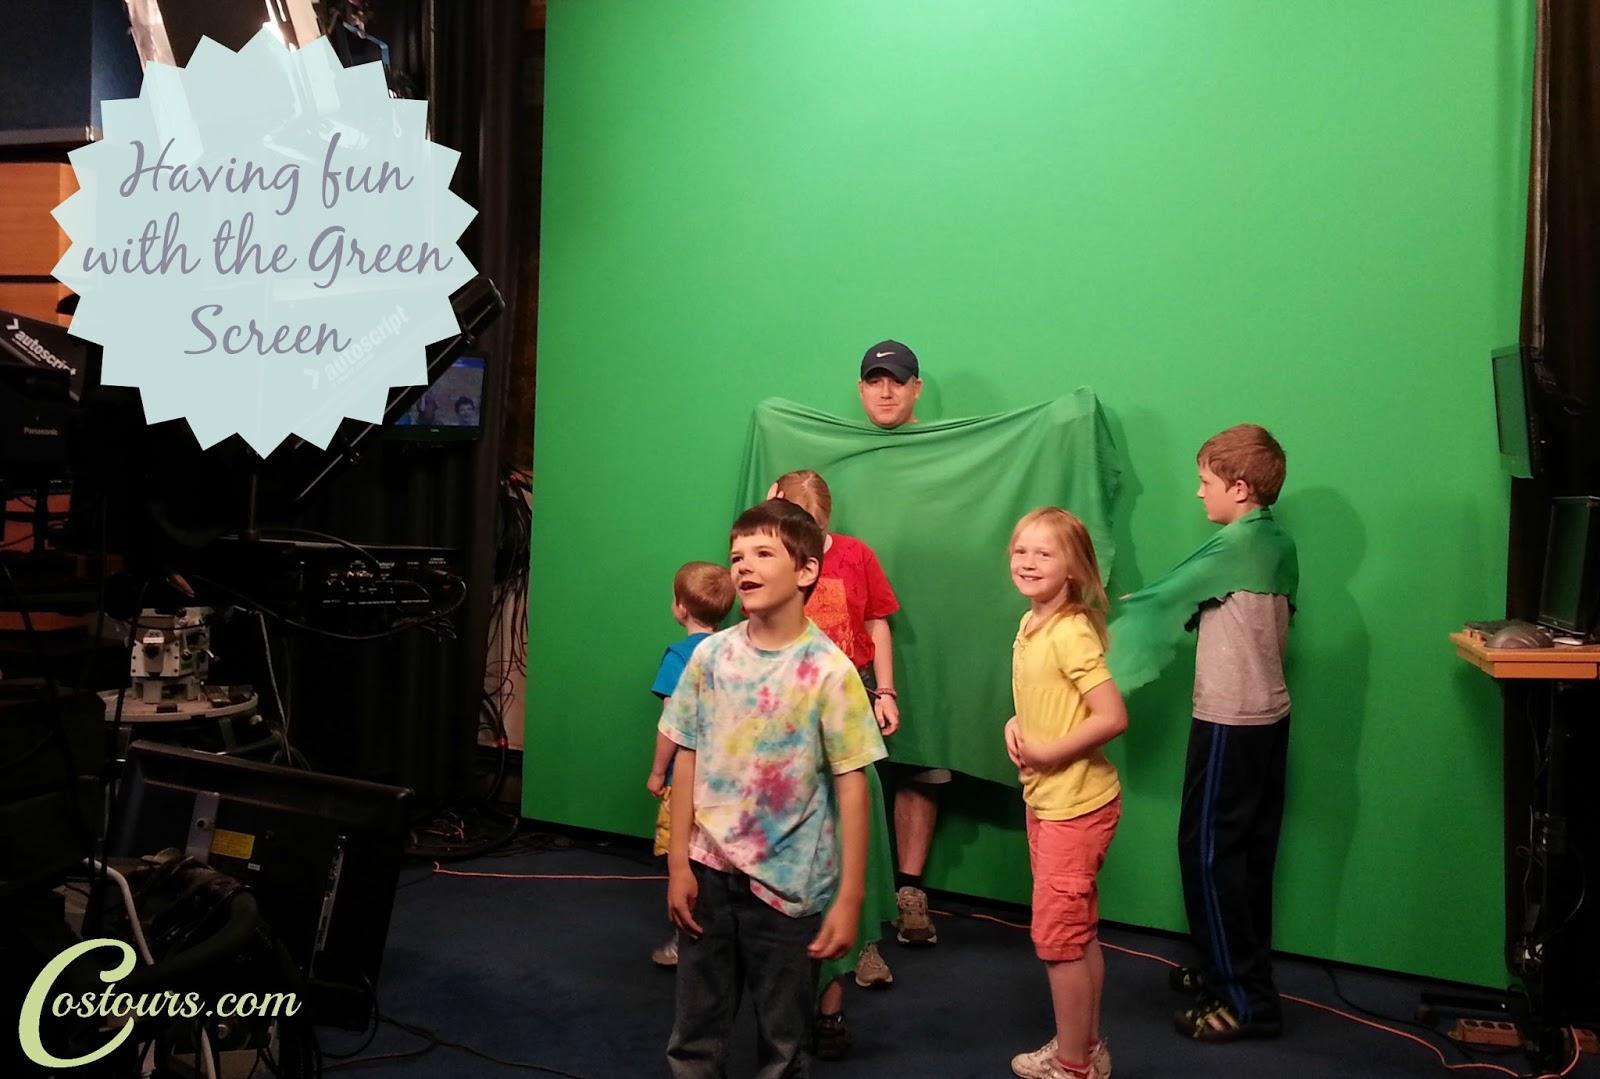 Green Screen Fun at KRDO 13